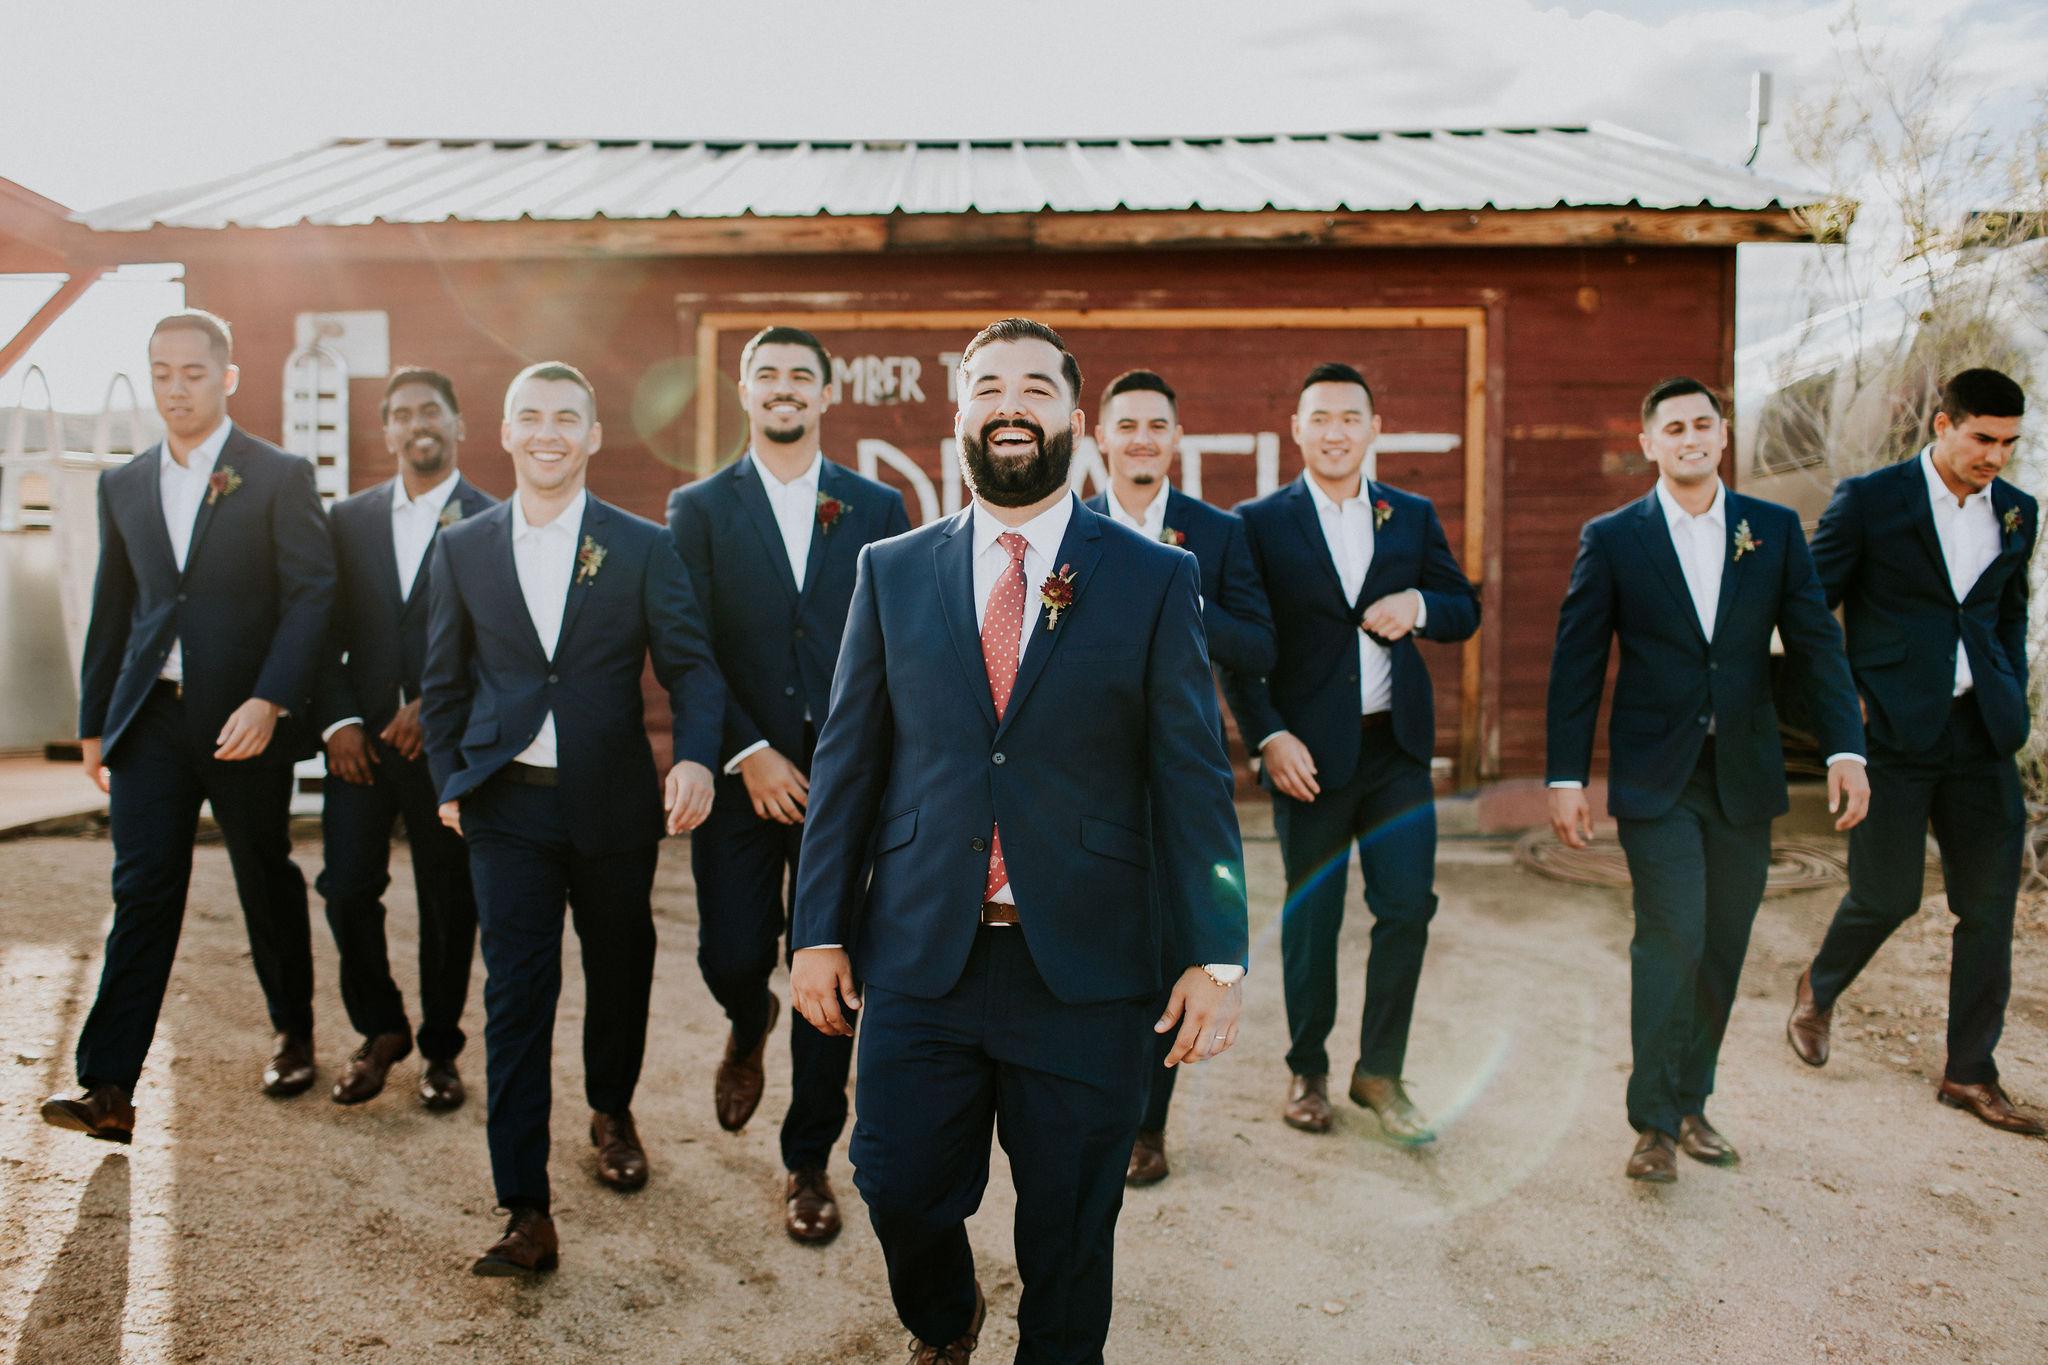 RimrockRanch-JoshuaTree-Wedding-Jami-Laree-468.jpg